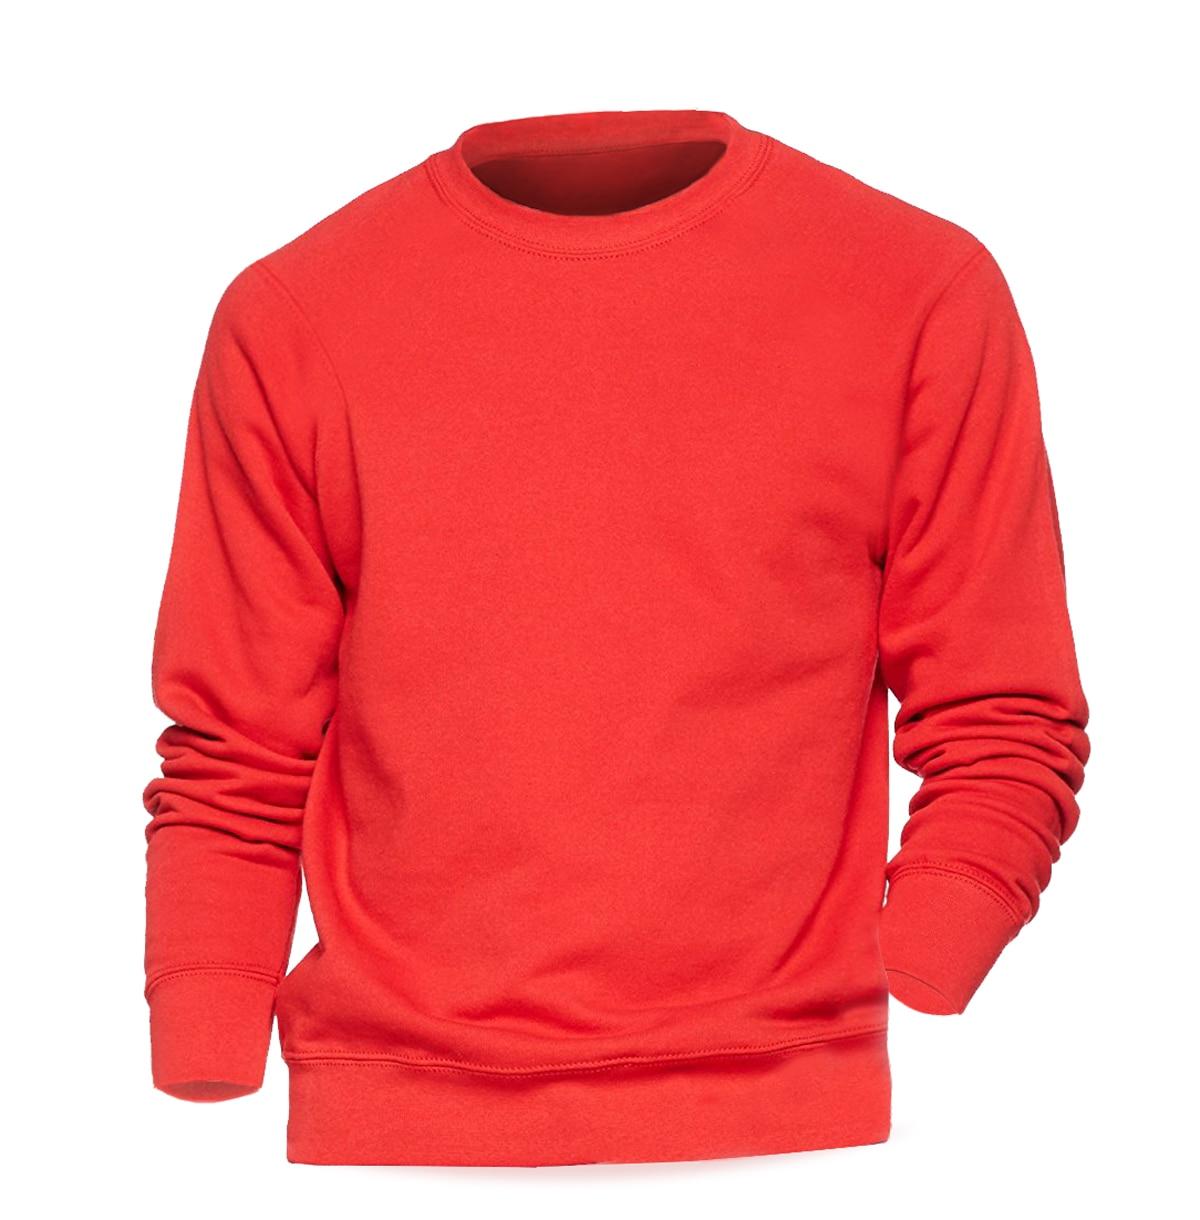 Solid color Sweatshirt Men Hoodie Crewneck Sweatshirts Winter Autumn Fleece Hoody Casual Gray Blue Red Black White Streetwear 5